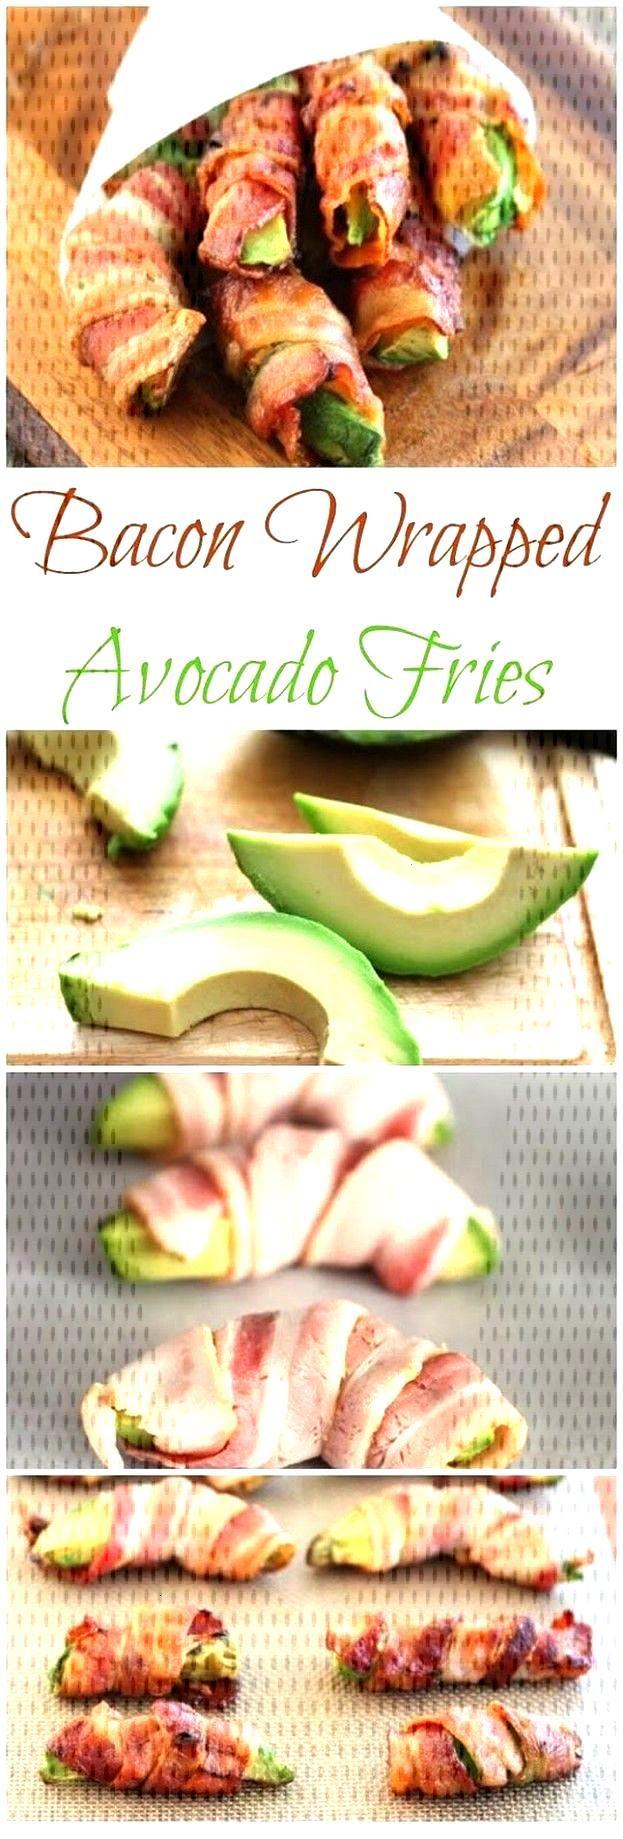 Mit Speck umwickelte Avocado - Pommes | Avocado-Rezepte Mit Speck umwickelte Avocado - Pommes | Avo